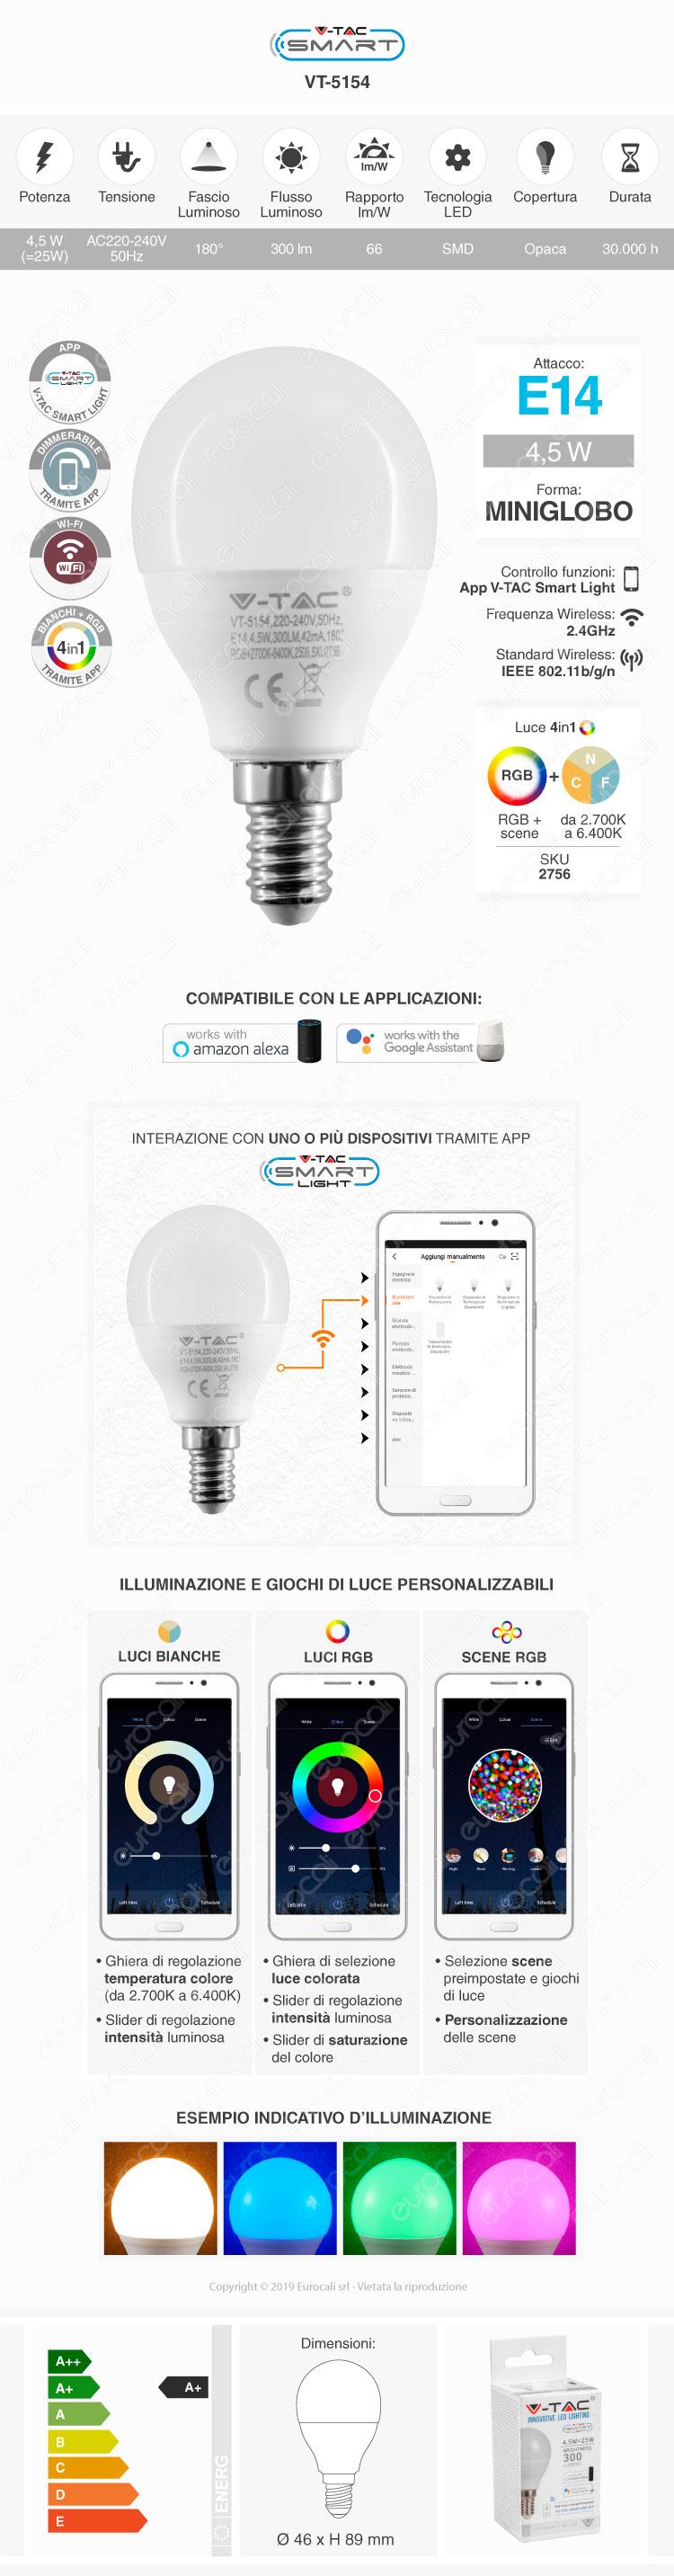 V-Tac Smart VT-5154 Lampadina LED Wi-Fi E14 4,5W MiniGlobo P45 RGB+W Dimmerabile